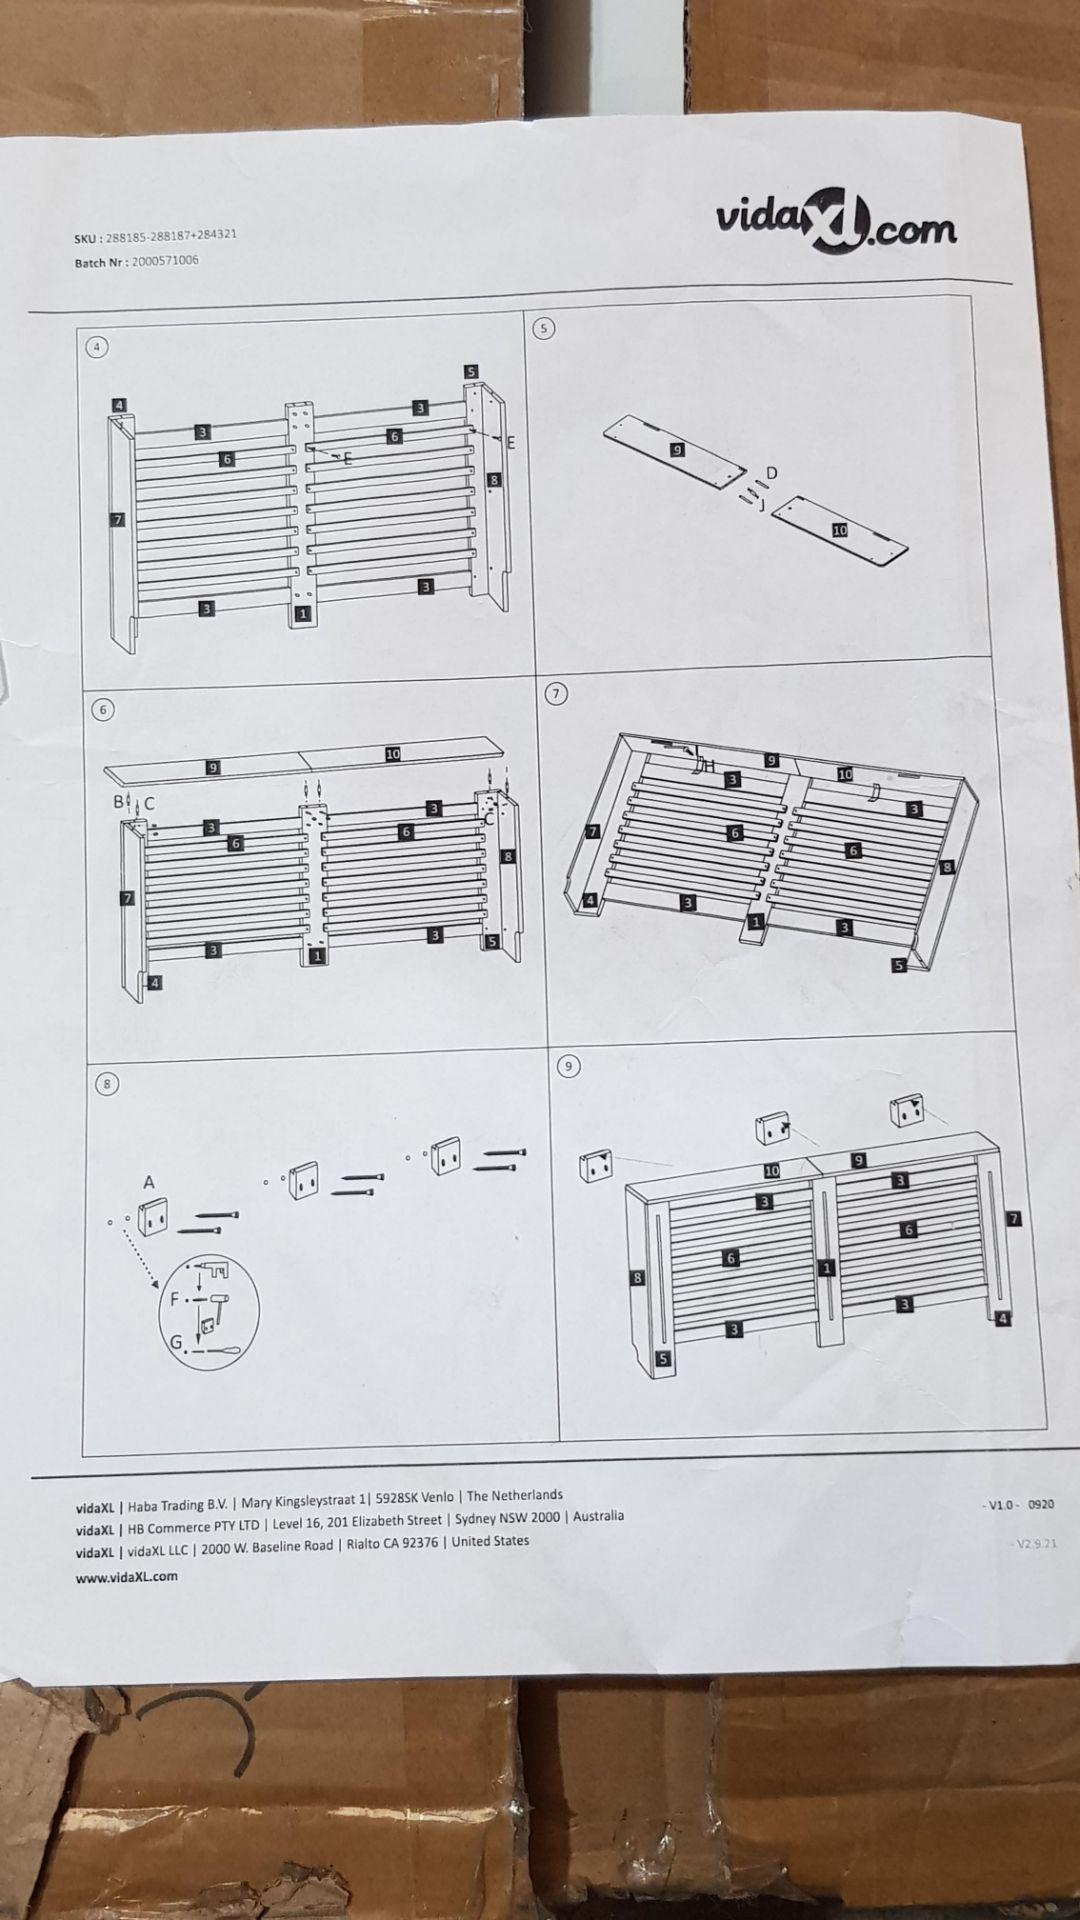 (3E) 2x Items. 1x Living Elements Bamboo Shoe Bench With Grey Cushion Seat. 1x VidaXL.com Radiator - Image 6 of 7